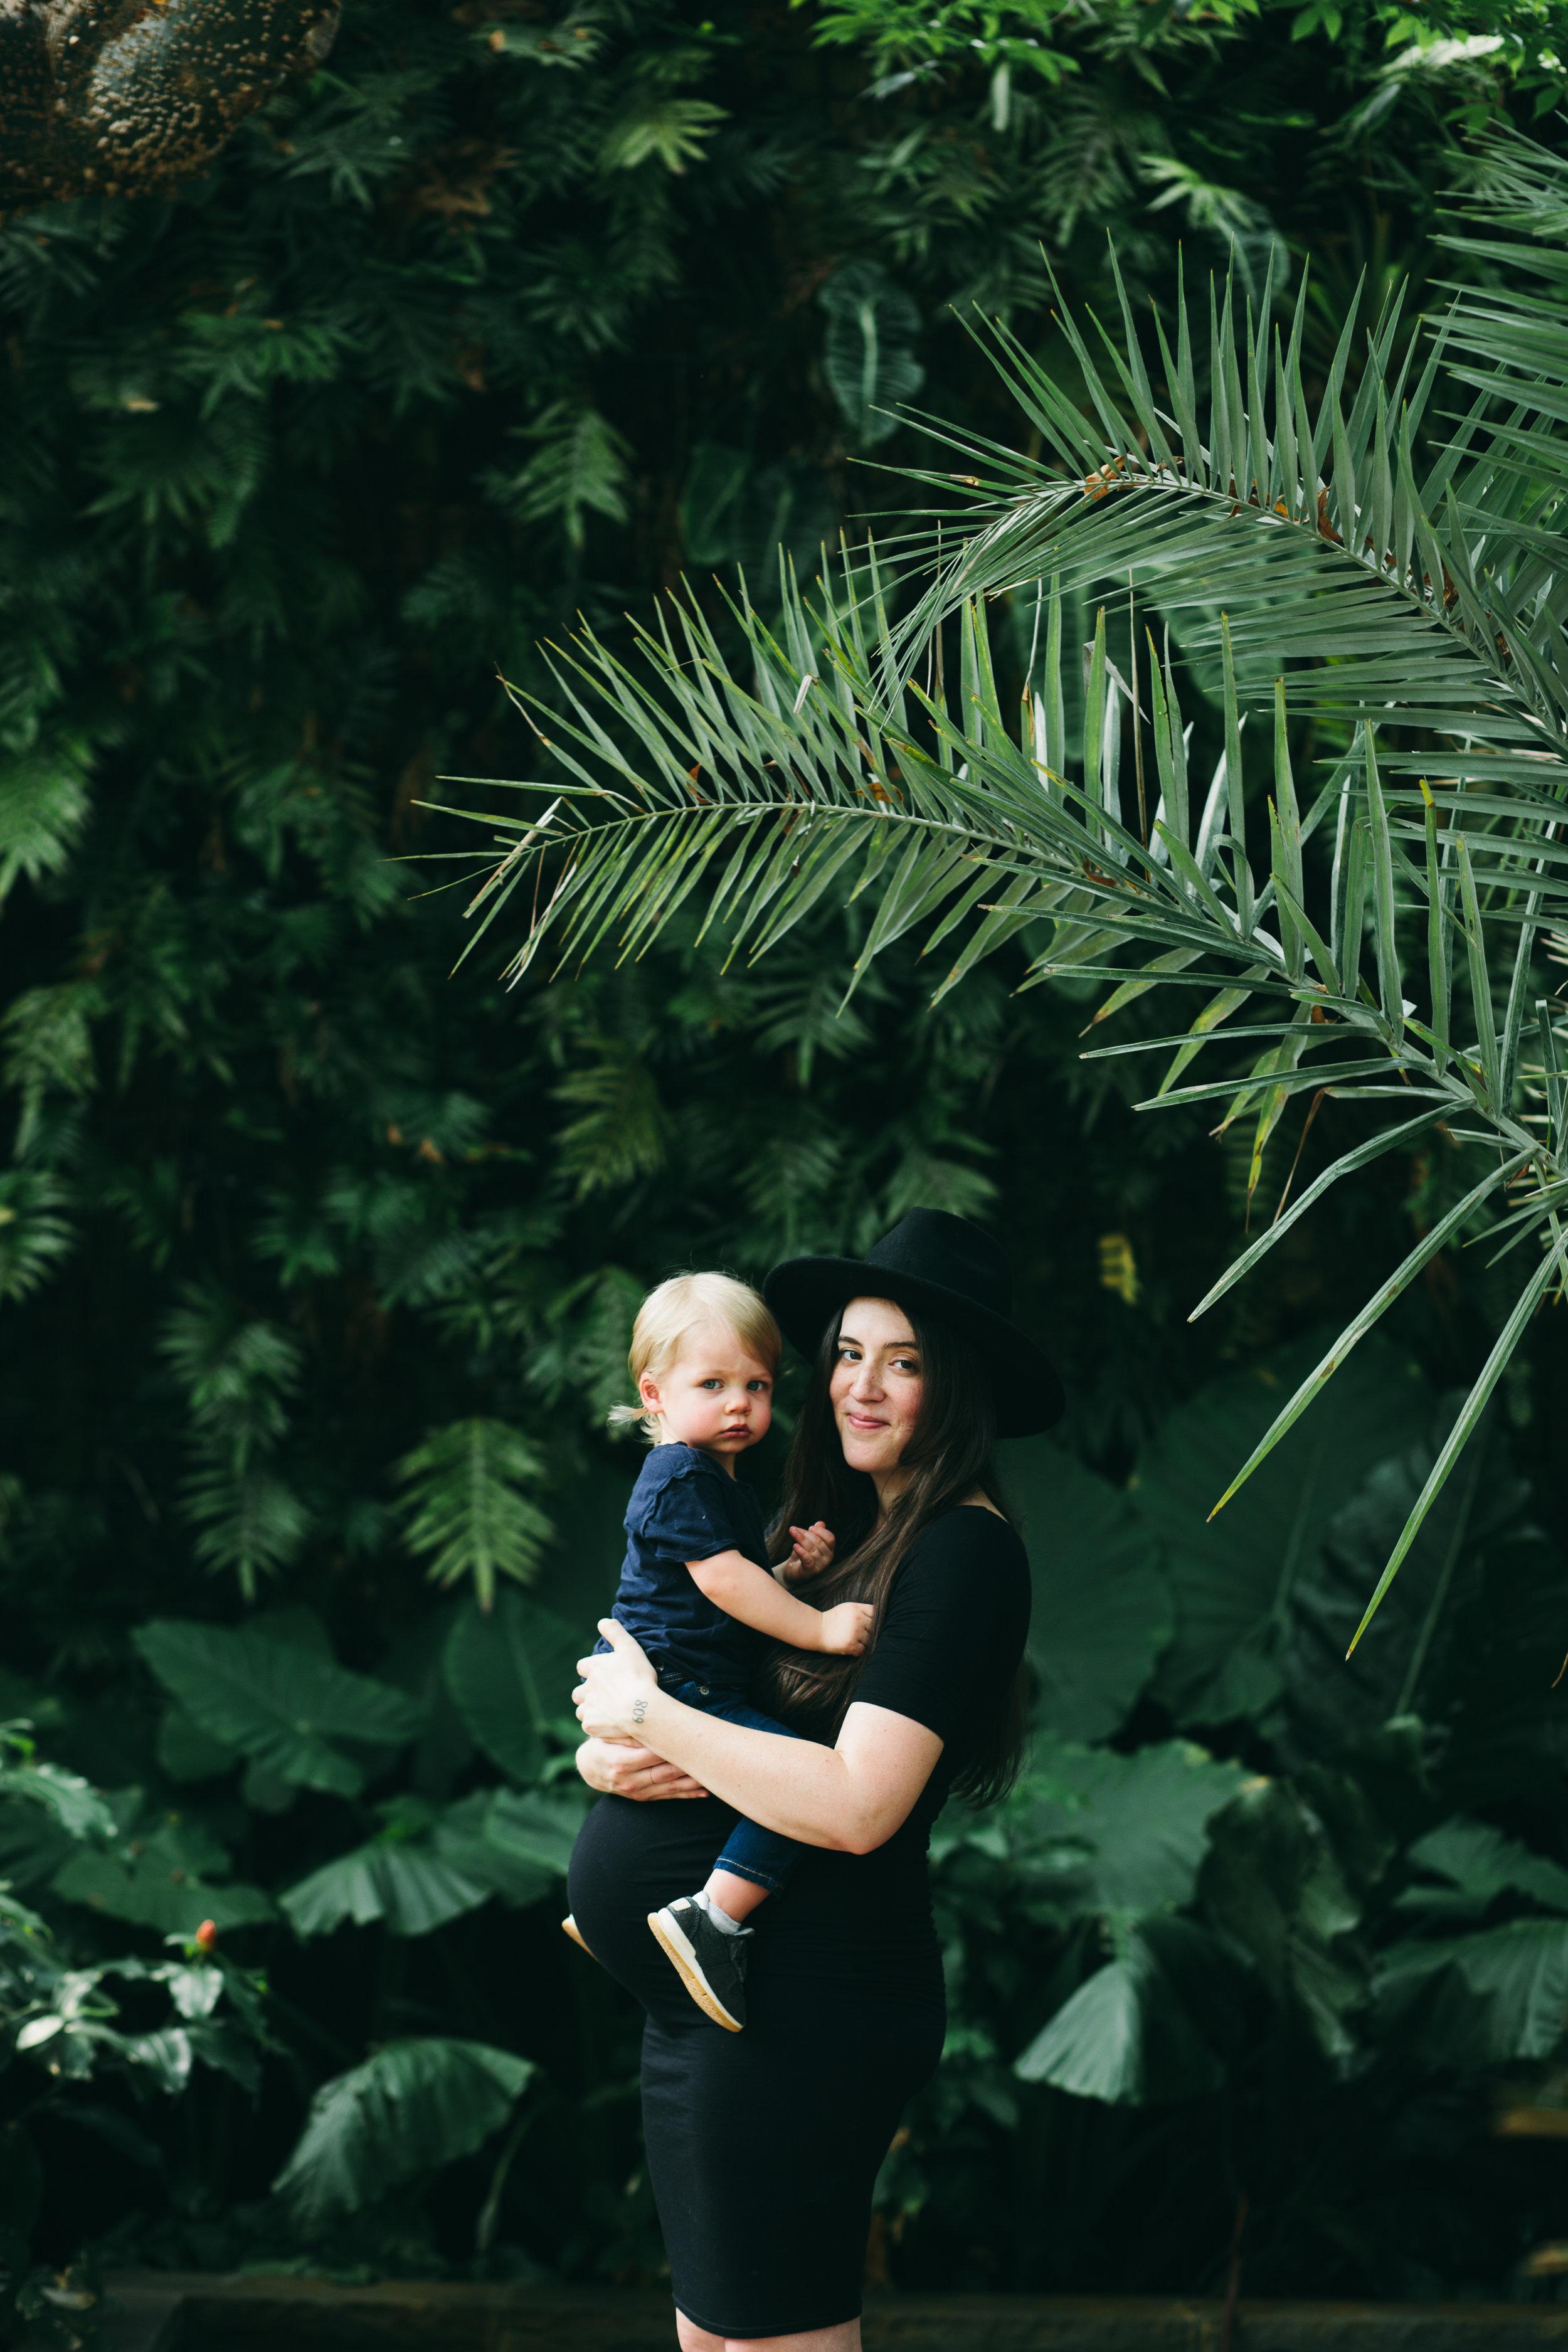 Christina-Hussey-Photography-356.jpg